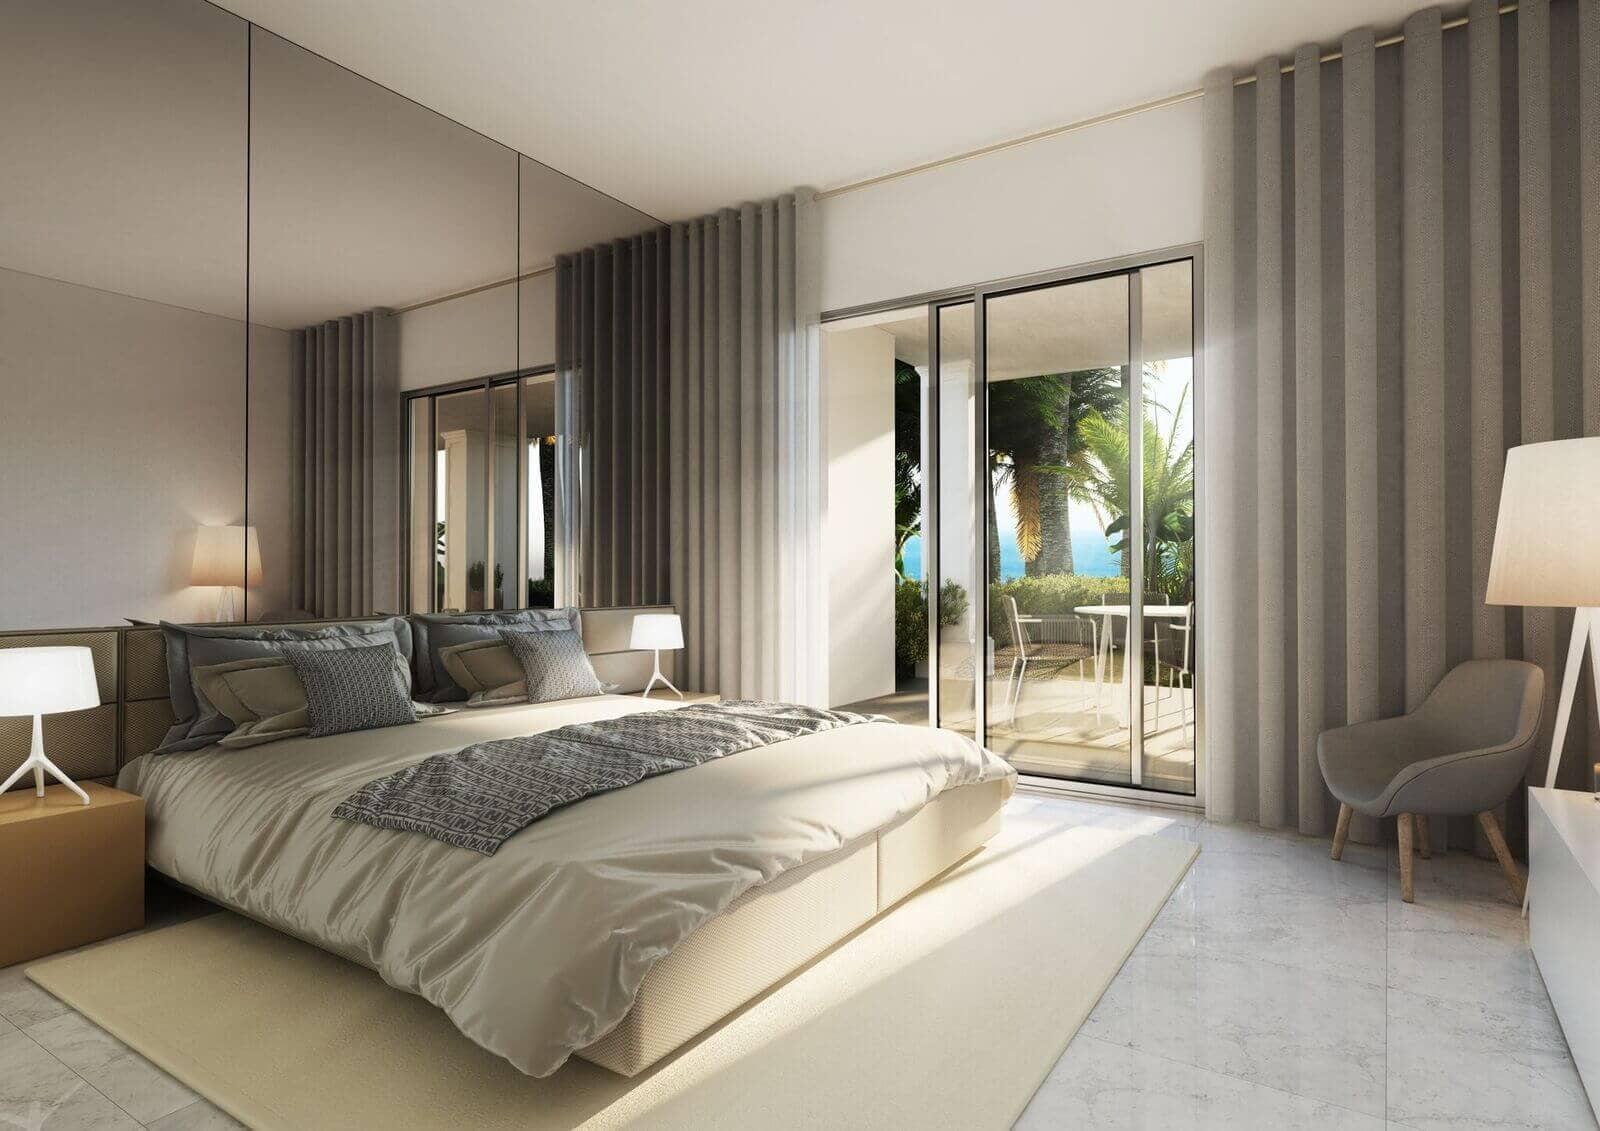 https://vamoz.be/wp-content/uploads/2018/01/mirador-de-estepona-new-golde-mile-appartement-penthouse-kopen-marbella-slaapkamer.jpeg